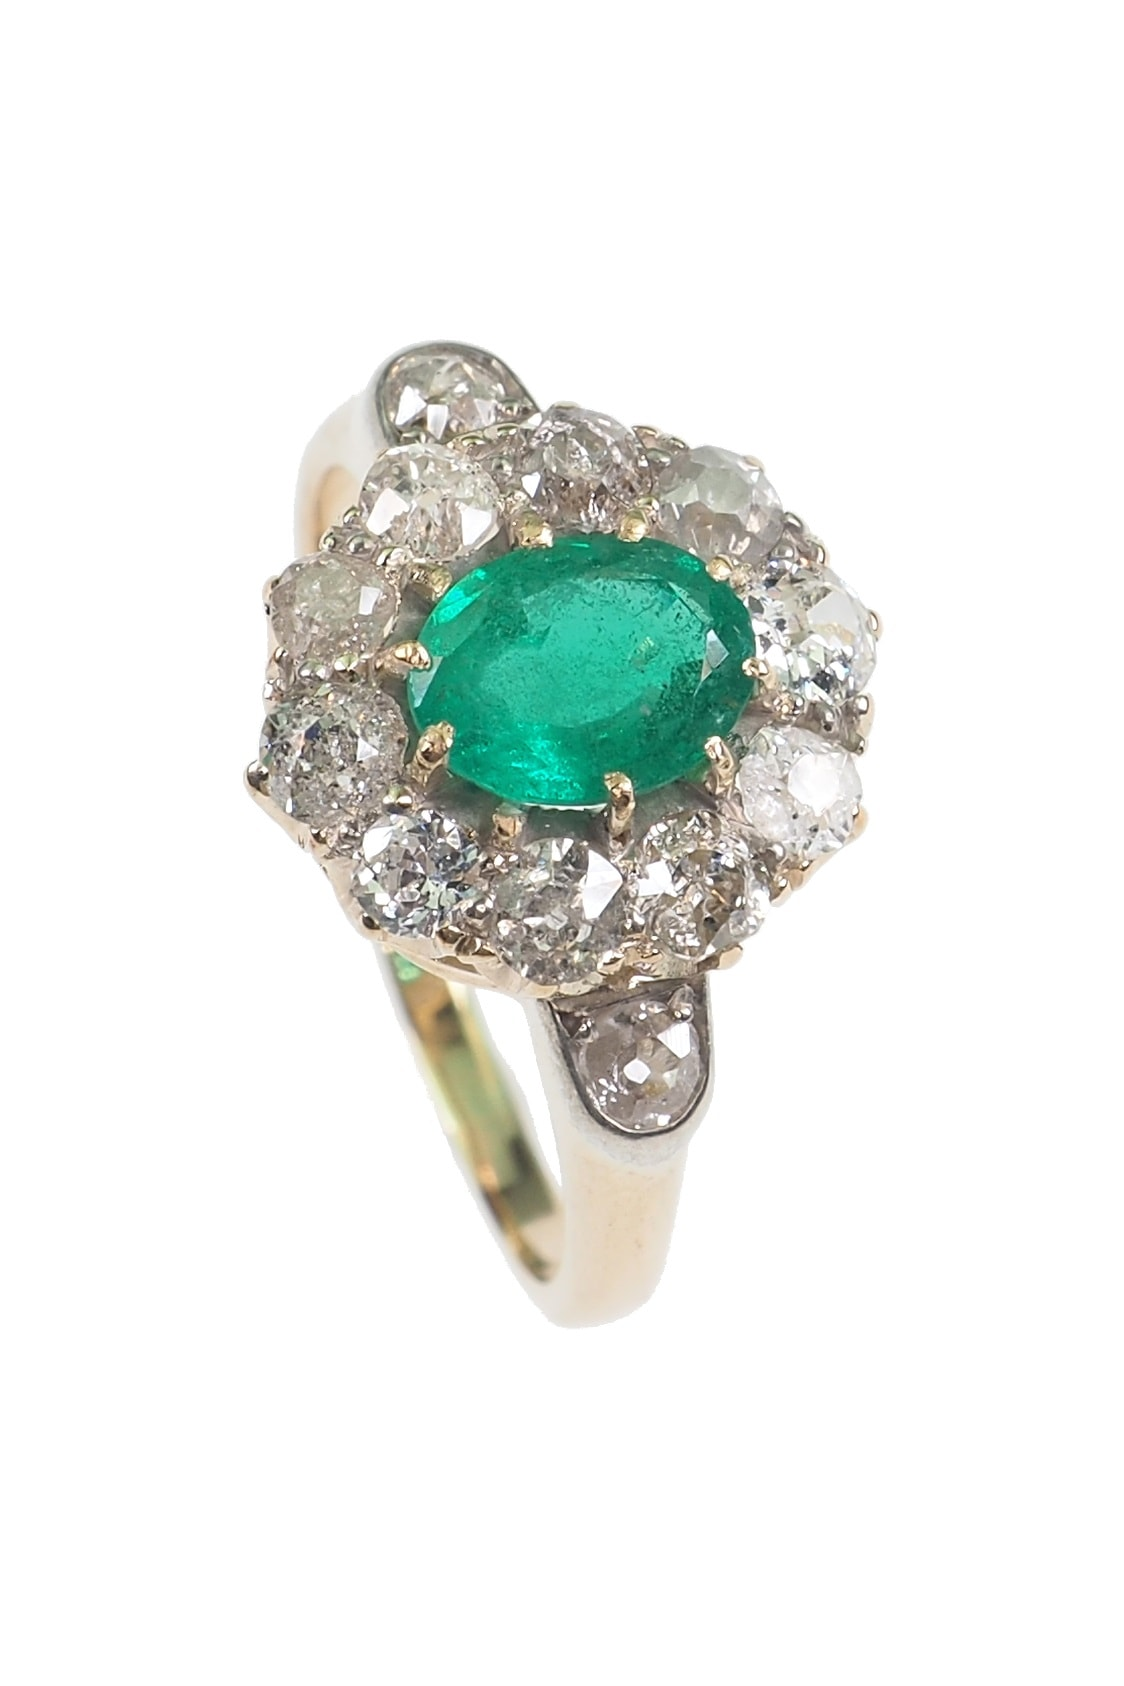 Smaragdring-online-kaufen-2523a